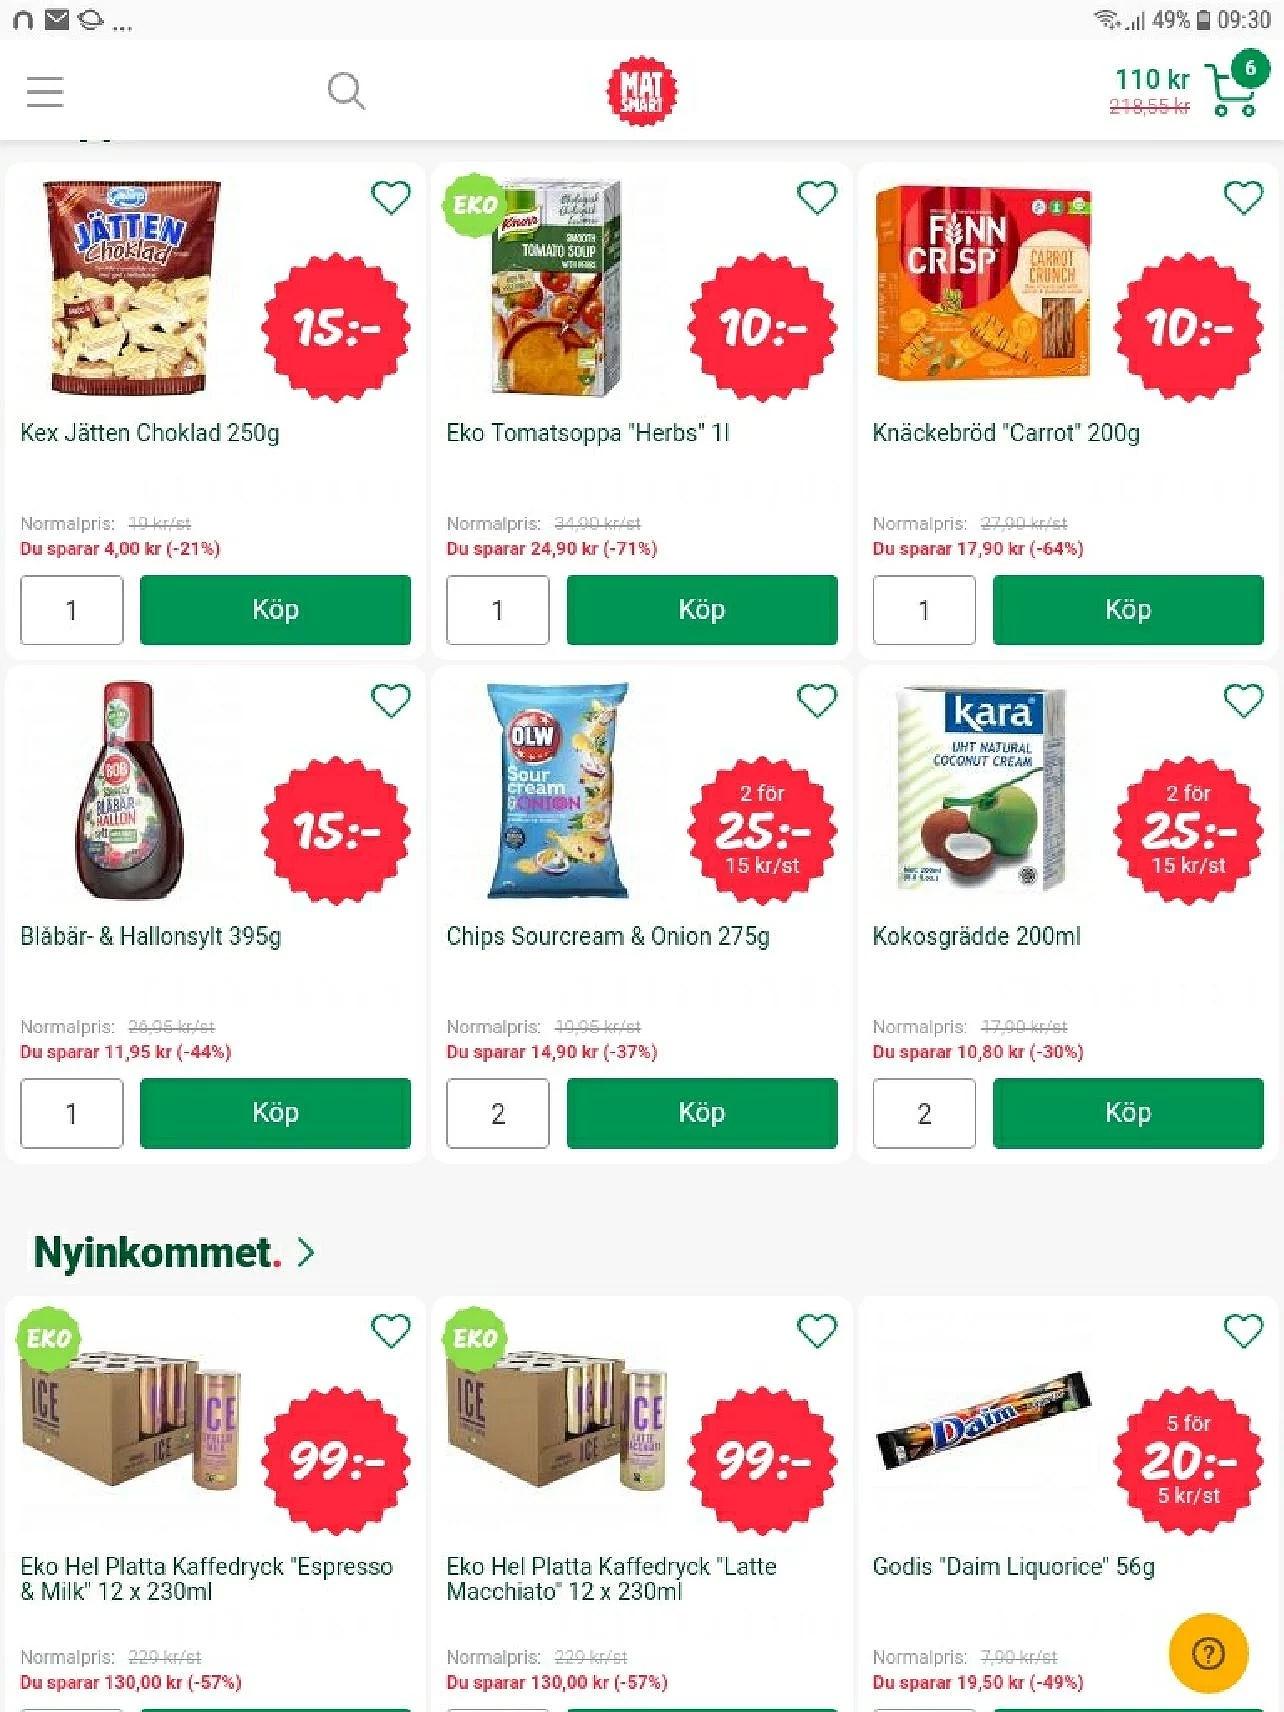 Matsmart.se 10% rabatt